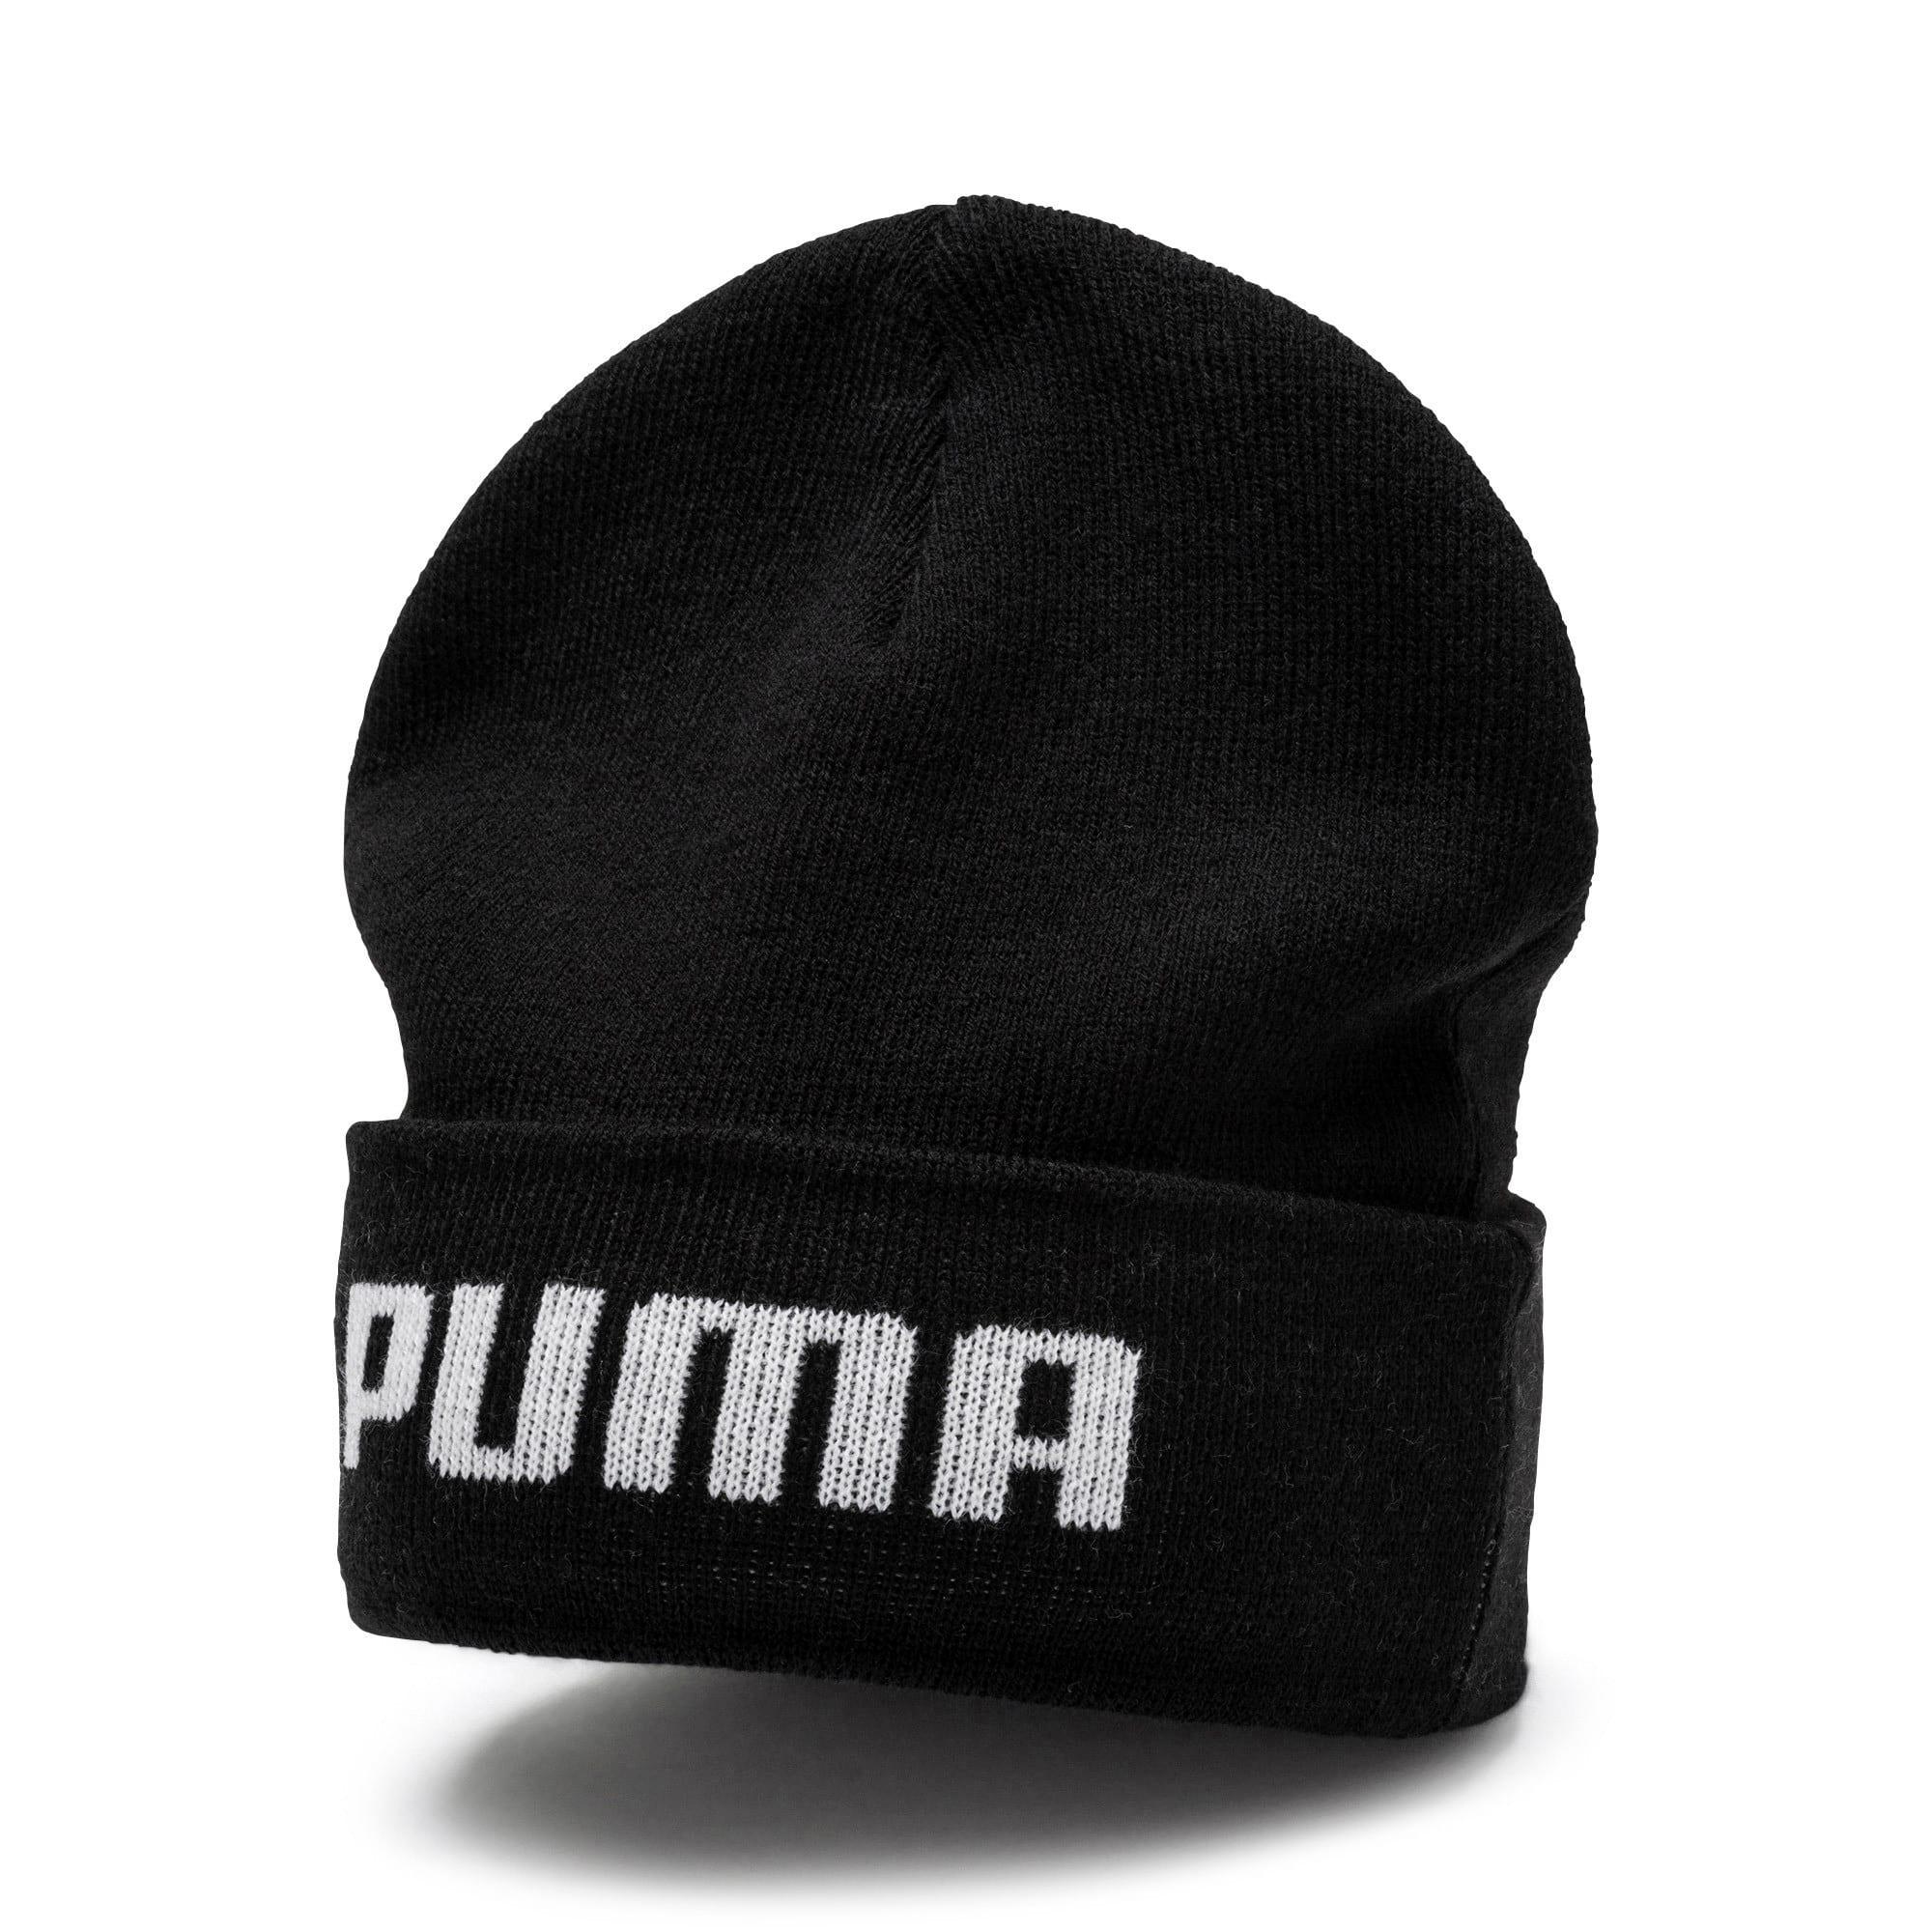 Thumbnail 1 of Mid Fit Beanie, Puma Black, medium